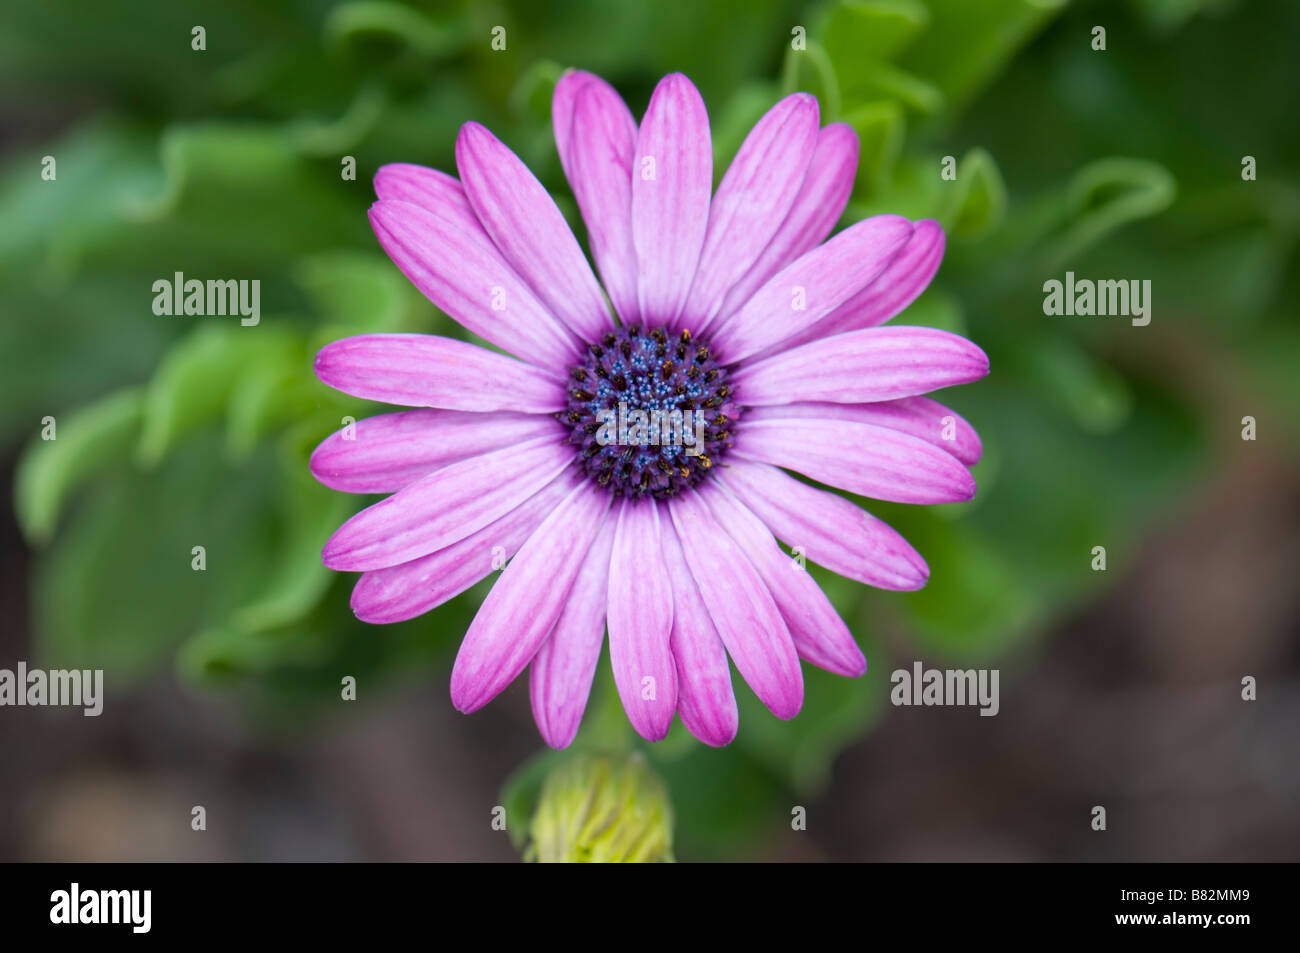 Blue-eyed African Daisy, Osteospermum growing in an Oklahoma, USA garden. - Stock Image